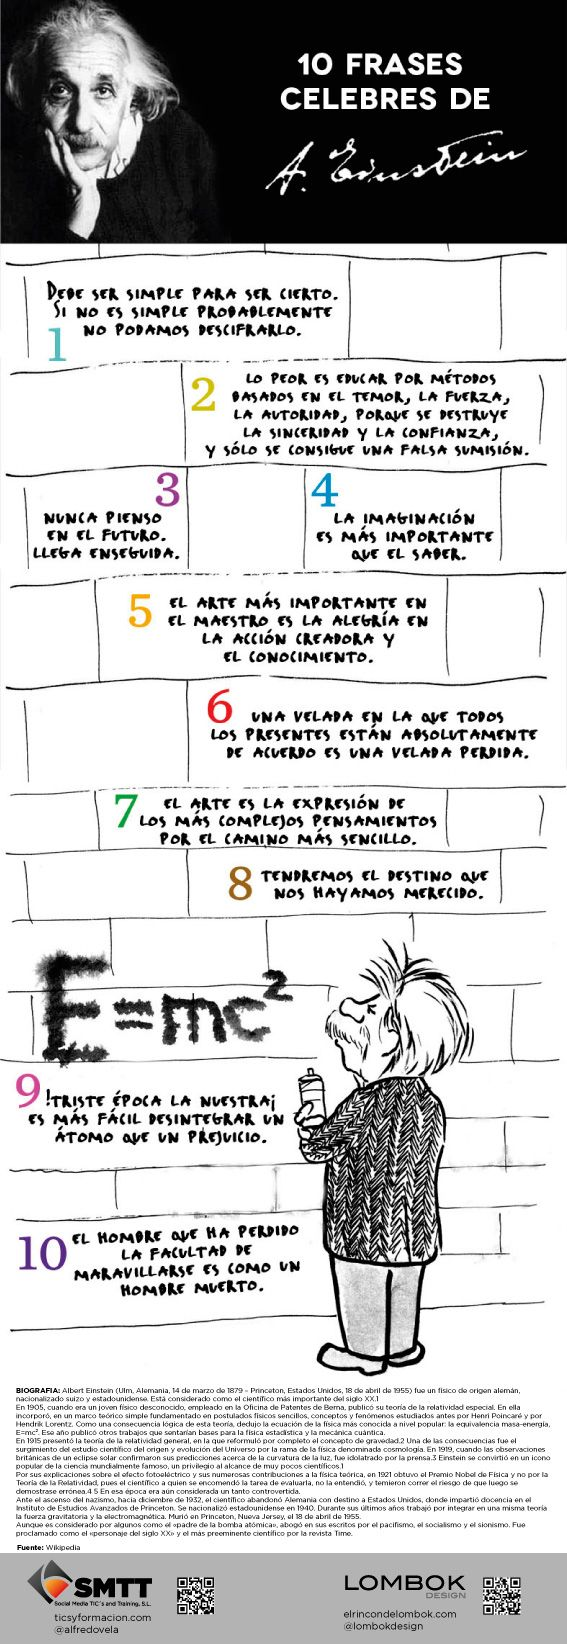 10 frases célebres de Einstein #infografia #infographic: Famous Quotes, Einstein Infografia, Quotations, De Albert, Célebres De, Frases Celebrity, Albert Einstein, 10 Sentences, Frases De Einstein